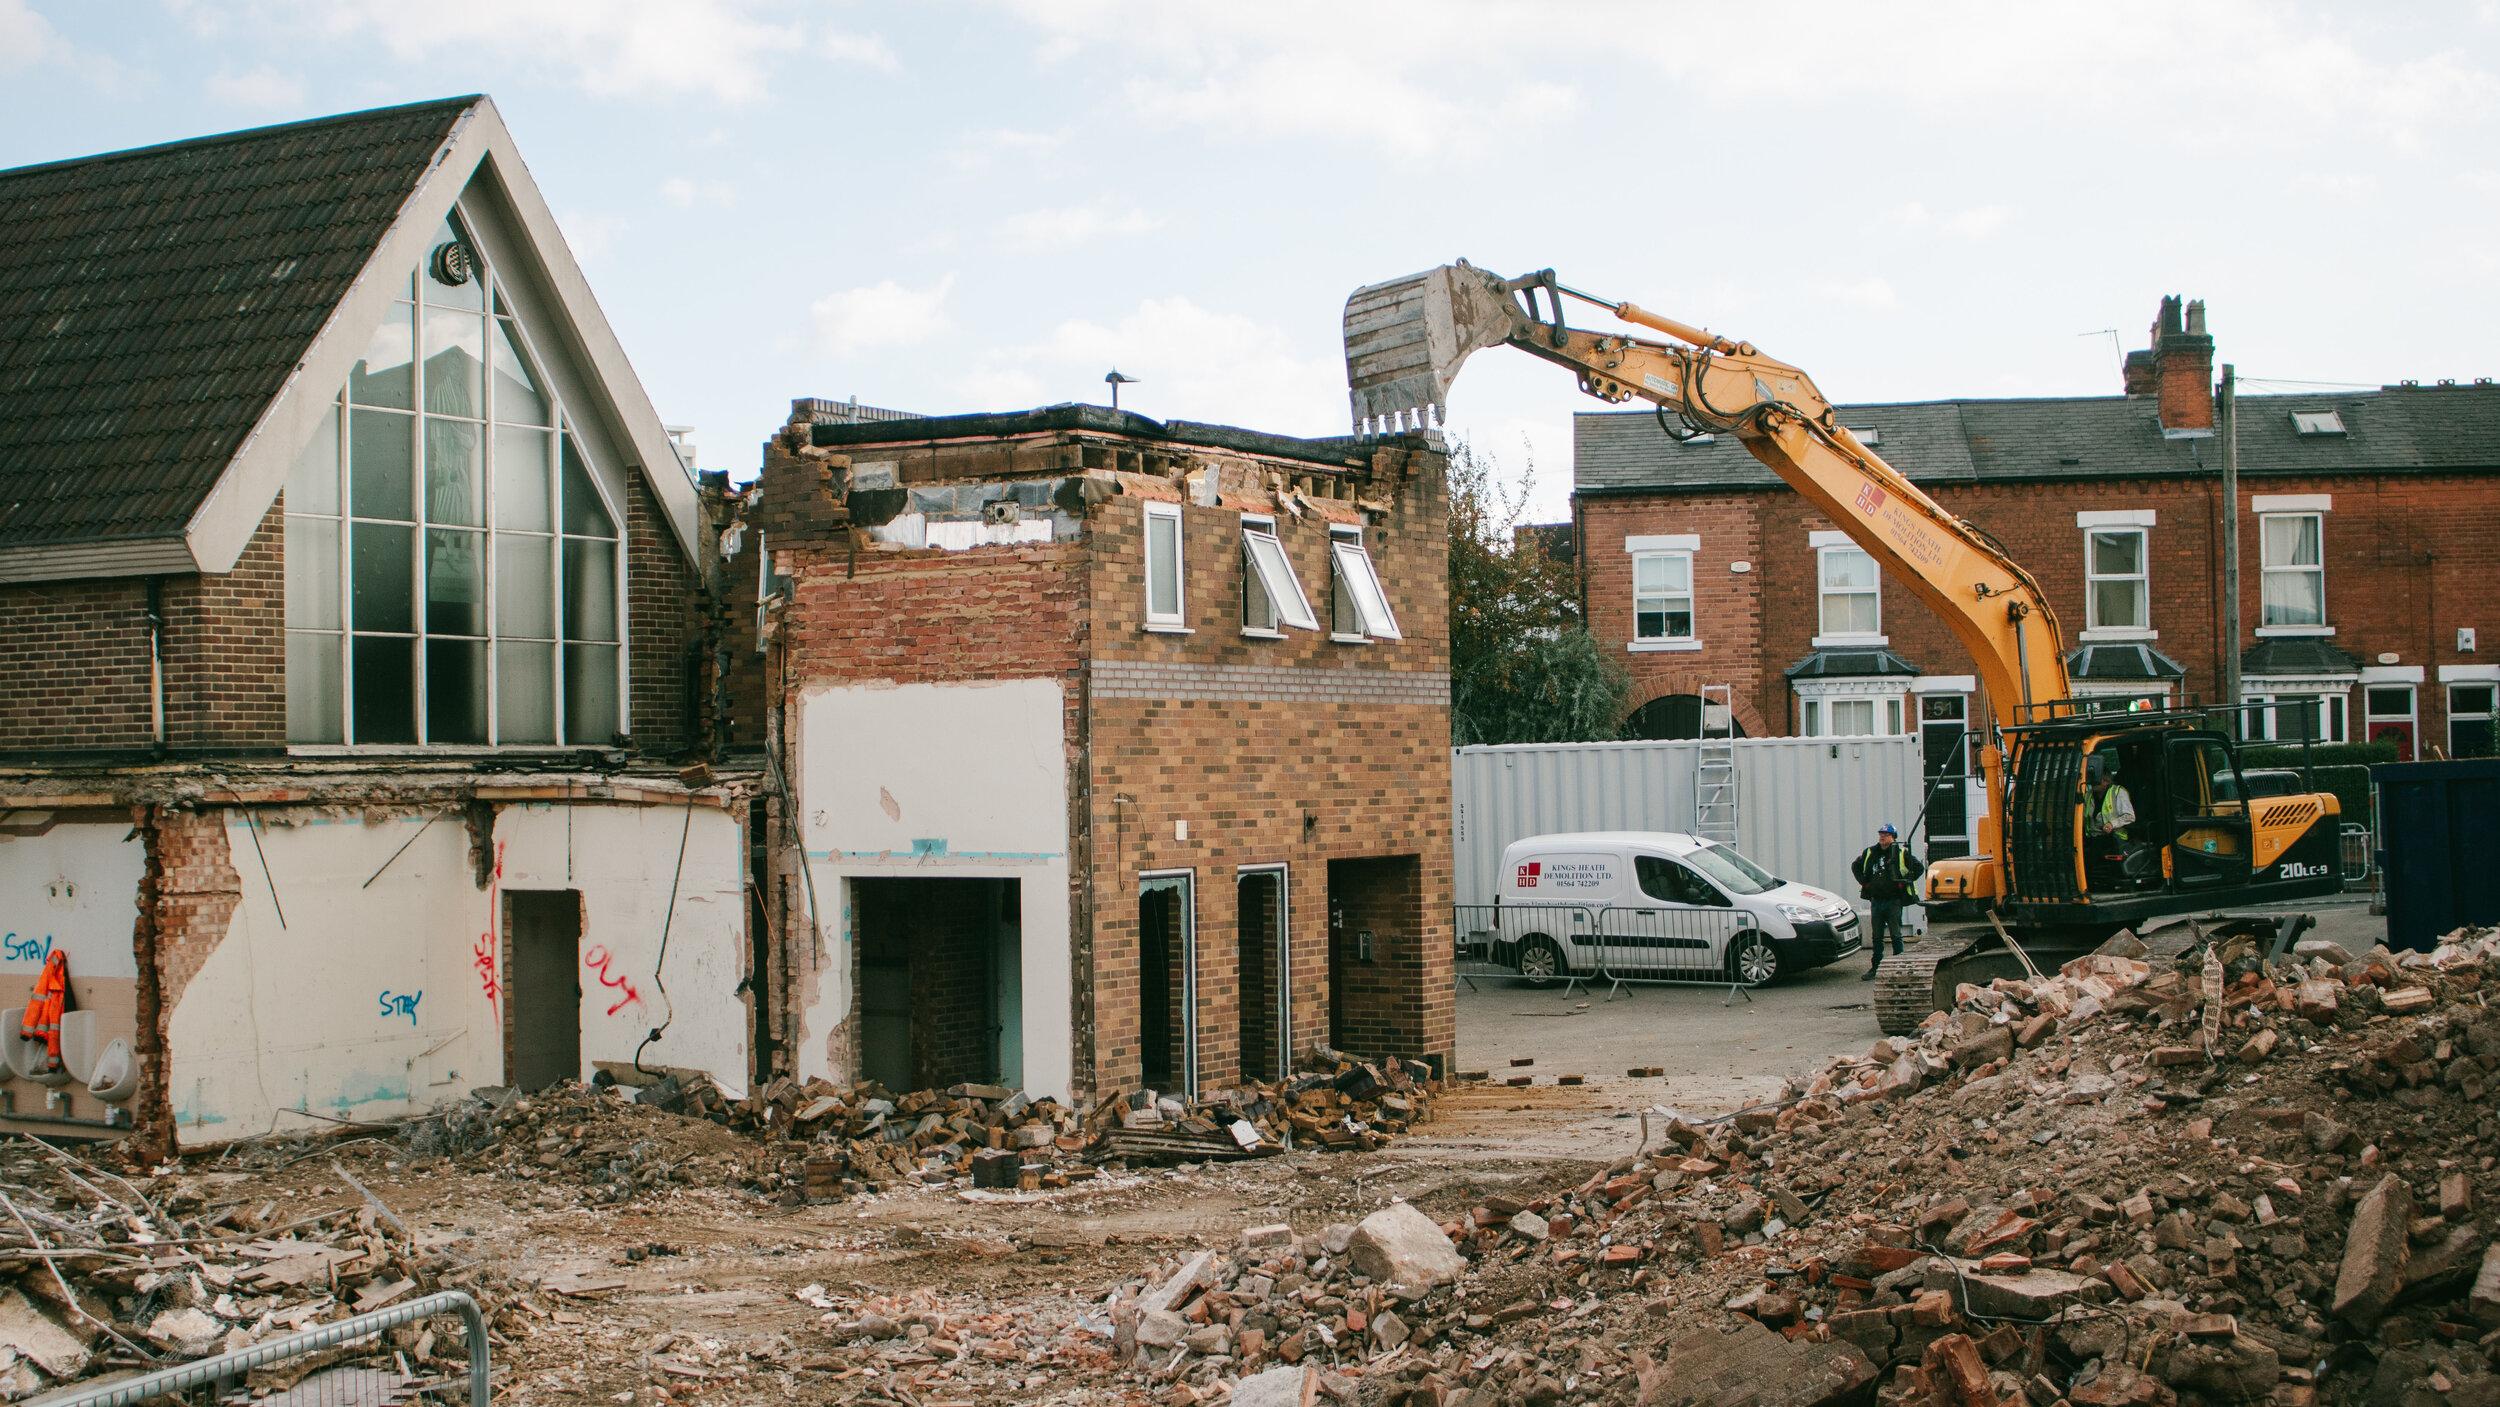 st-johns-harborne-bfm-demolition-oct-19-eo-2965-low.jpg